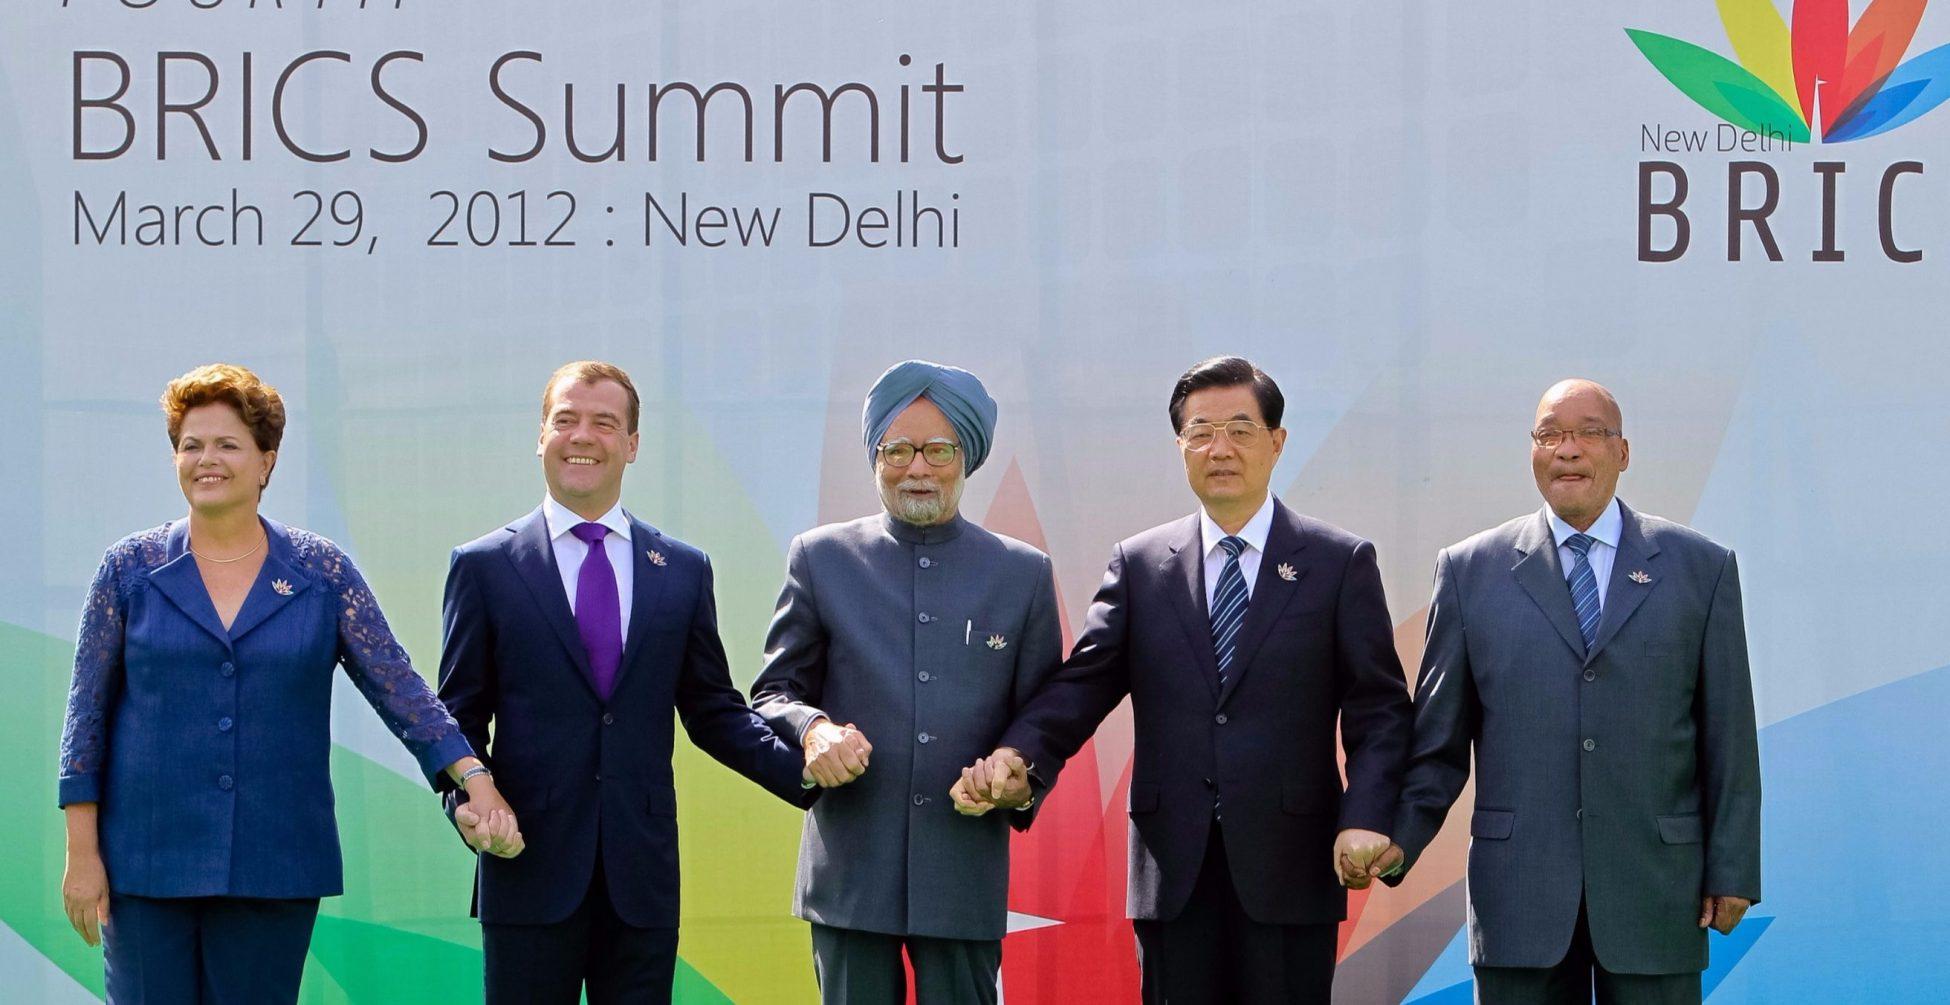 2012 BRICS Summit